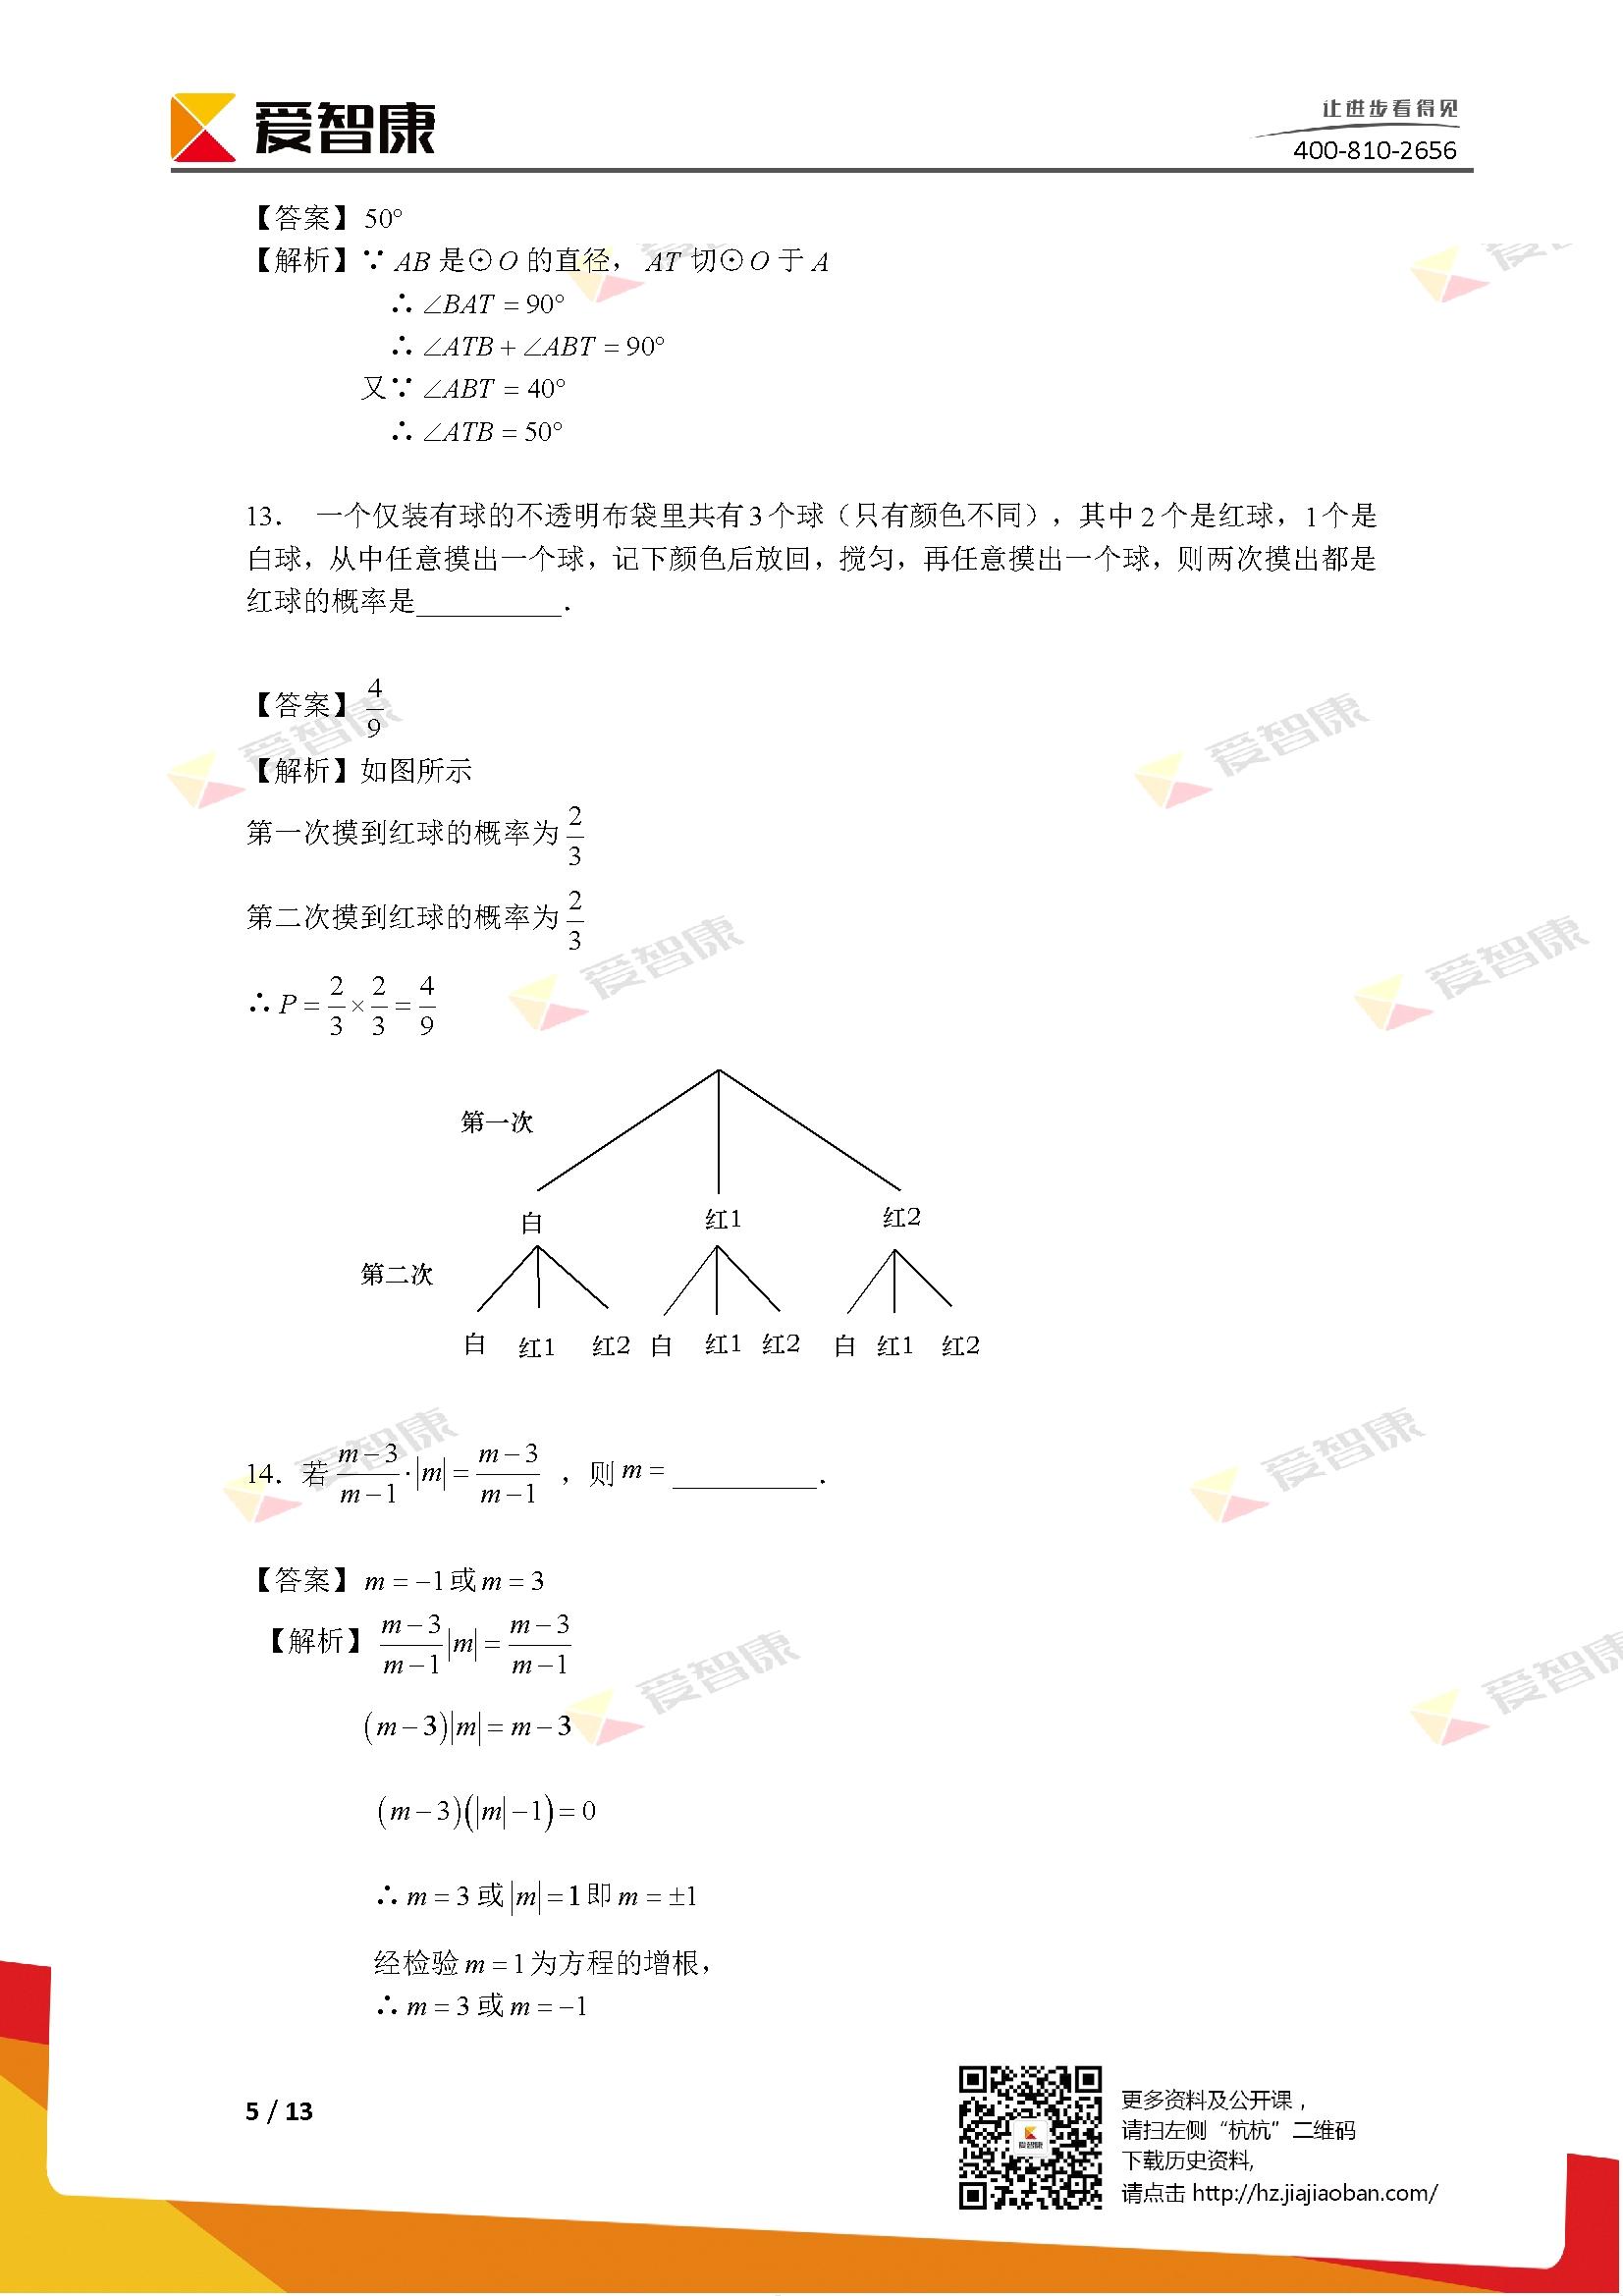 Microsoft Word - 2017年杭州市中考数学试卷解析25.jpg